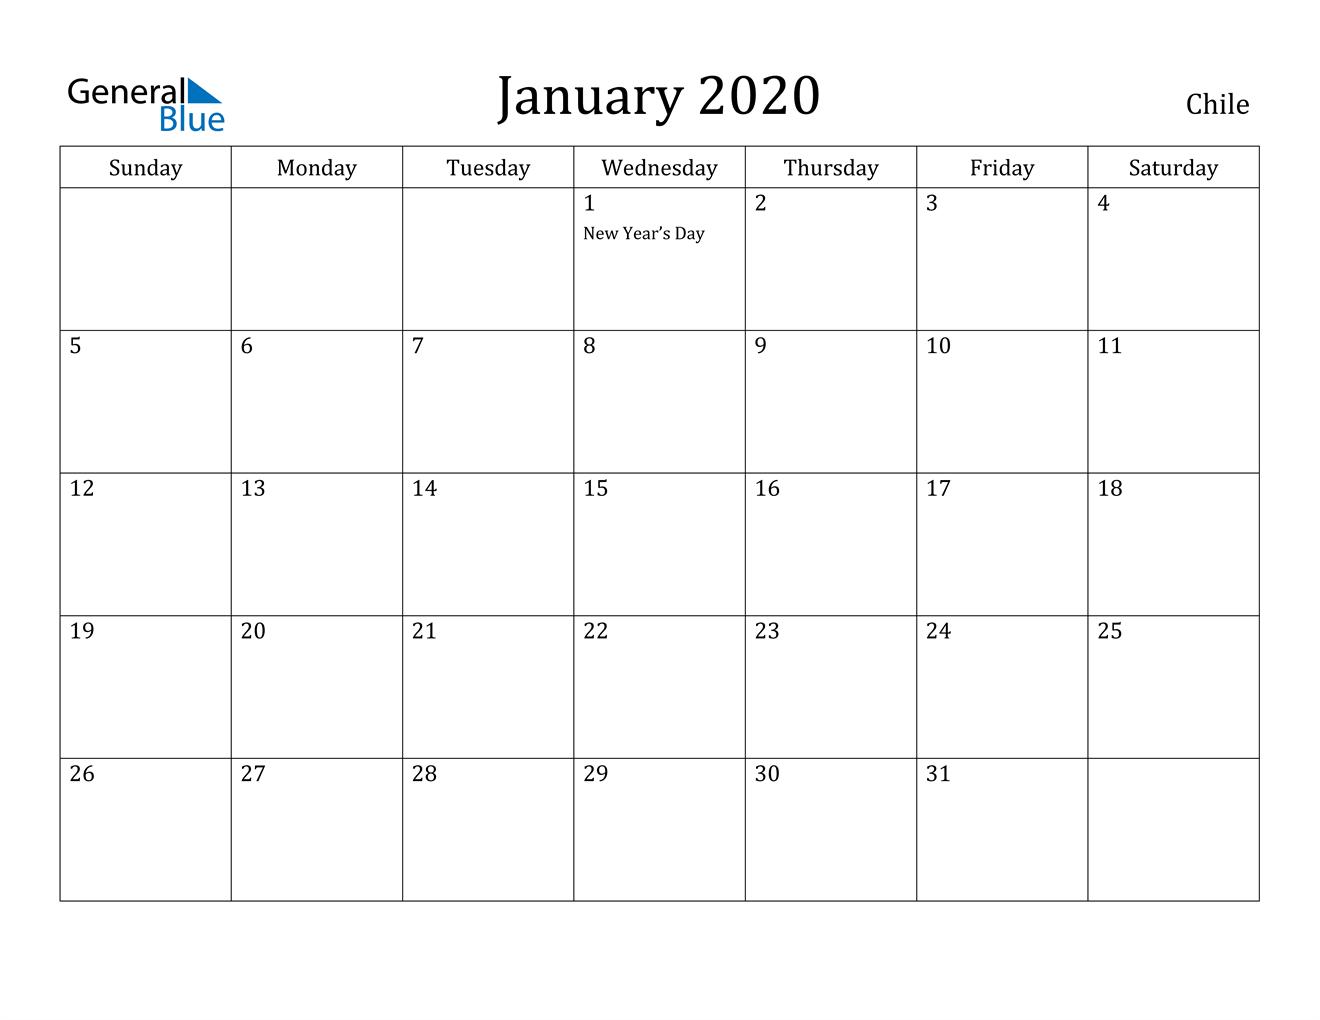 Image of January 2020 Chile Calendar with Holidays Calendar